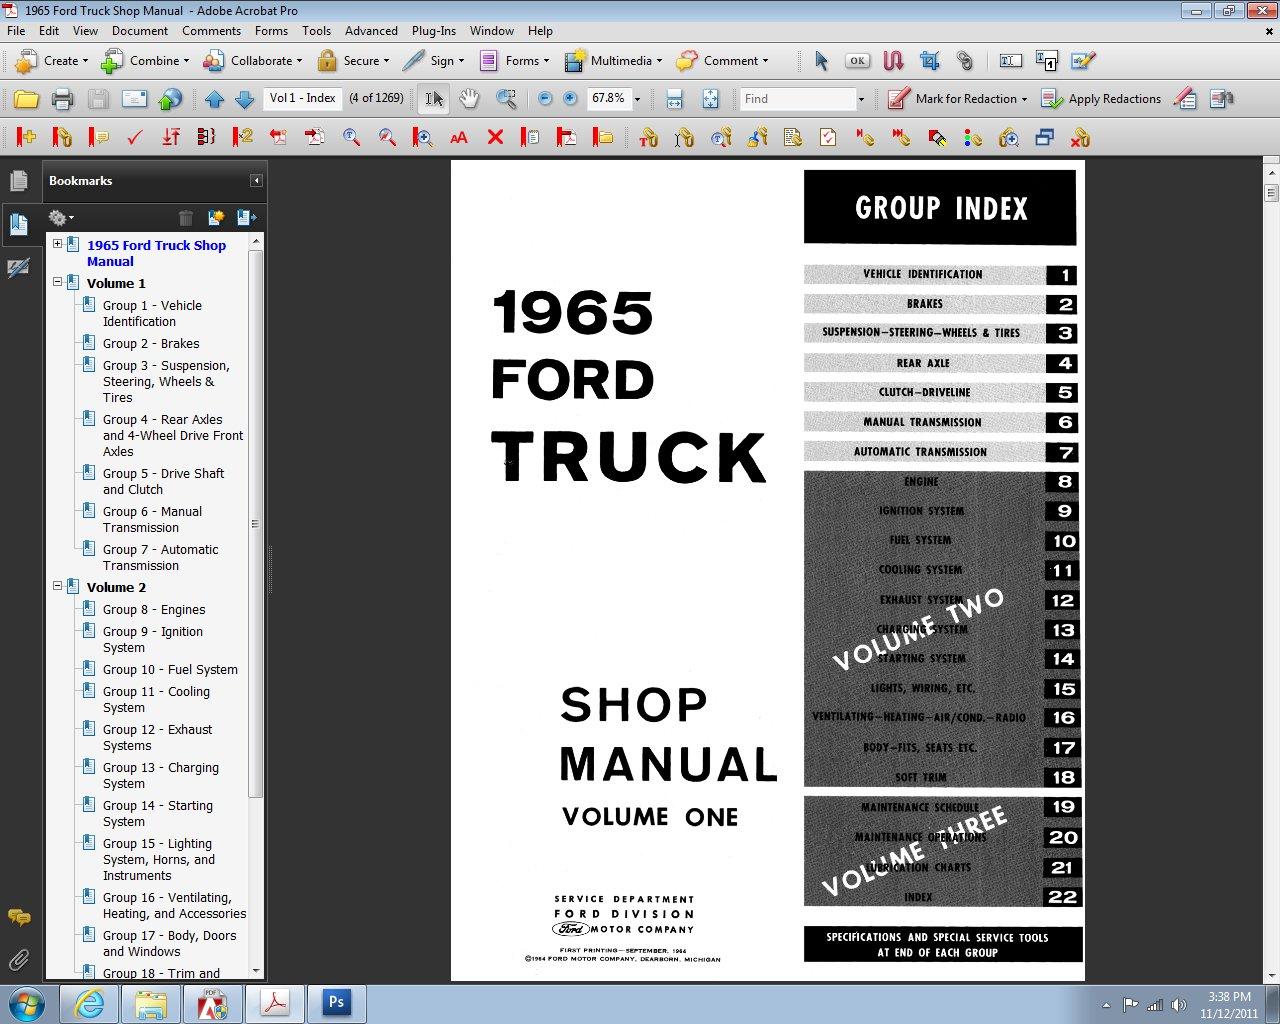 1965 Ford Truck Shop Manual: Ford Motor Company, David E. LeBlanc:  9781603710732: Amazon.com: Books